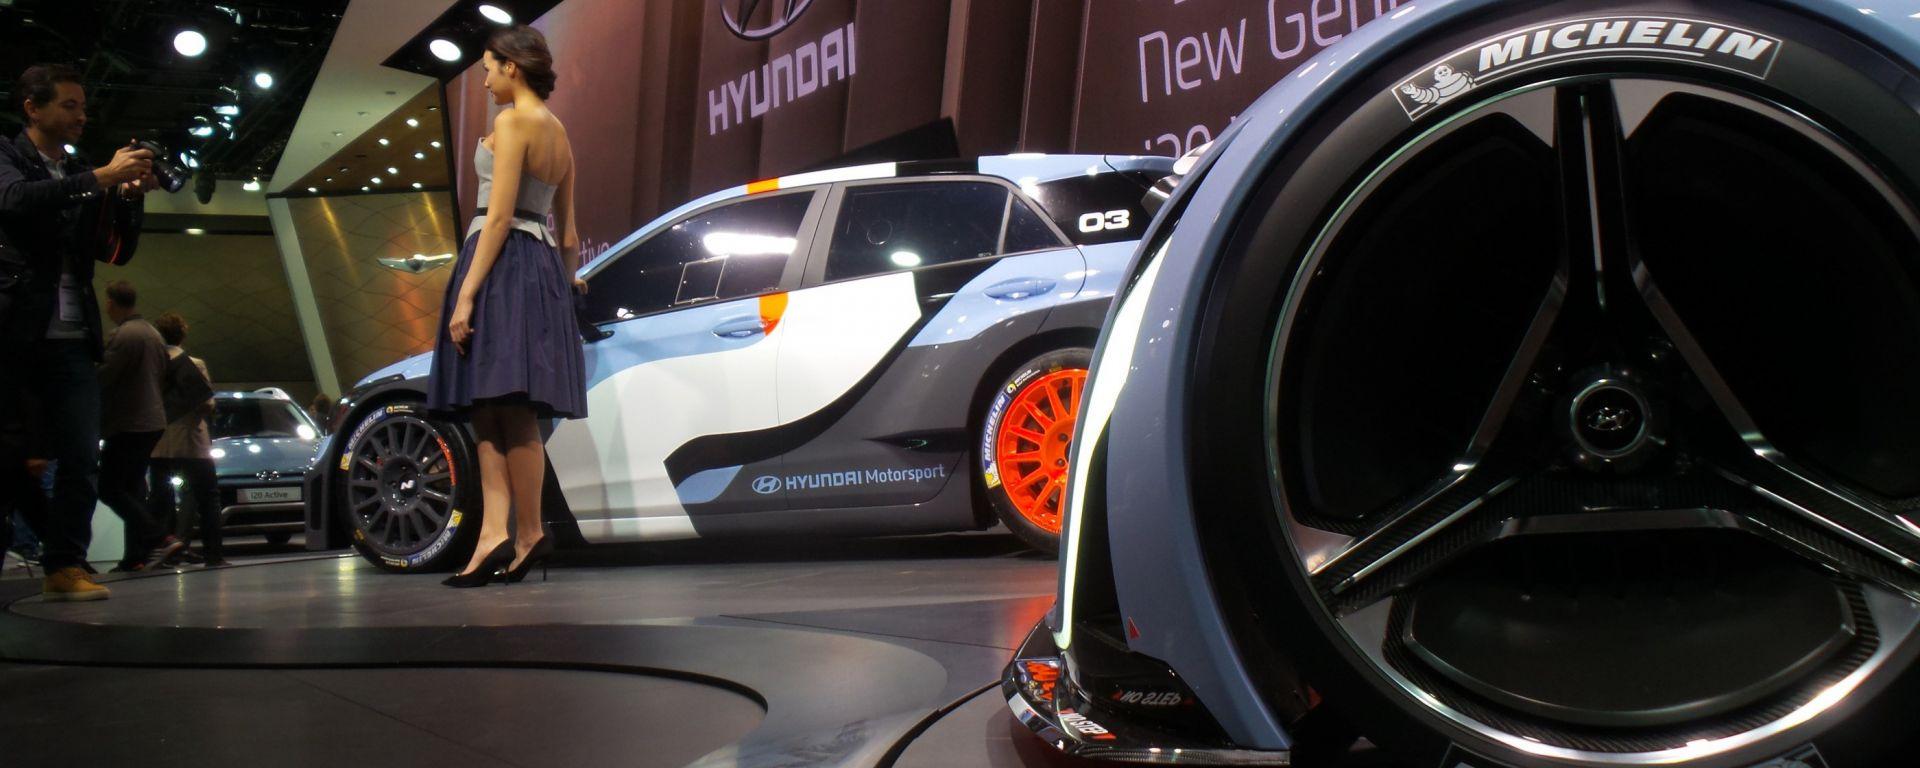 IAA Francoforte 2015: le novità Hyundai